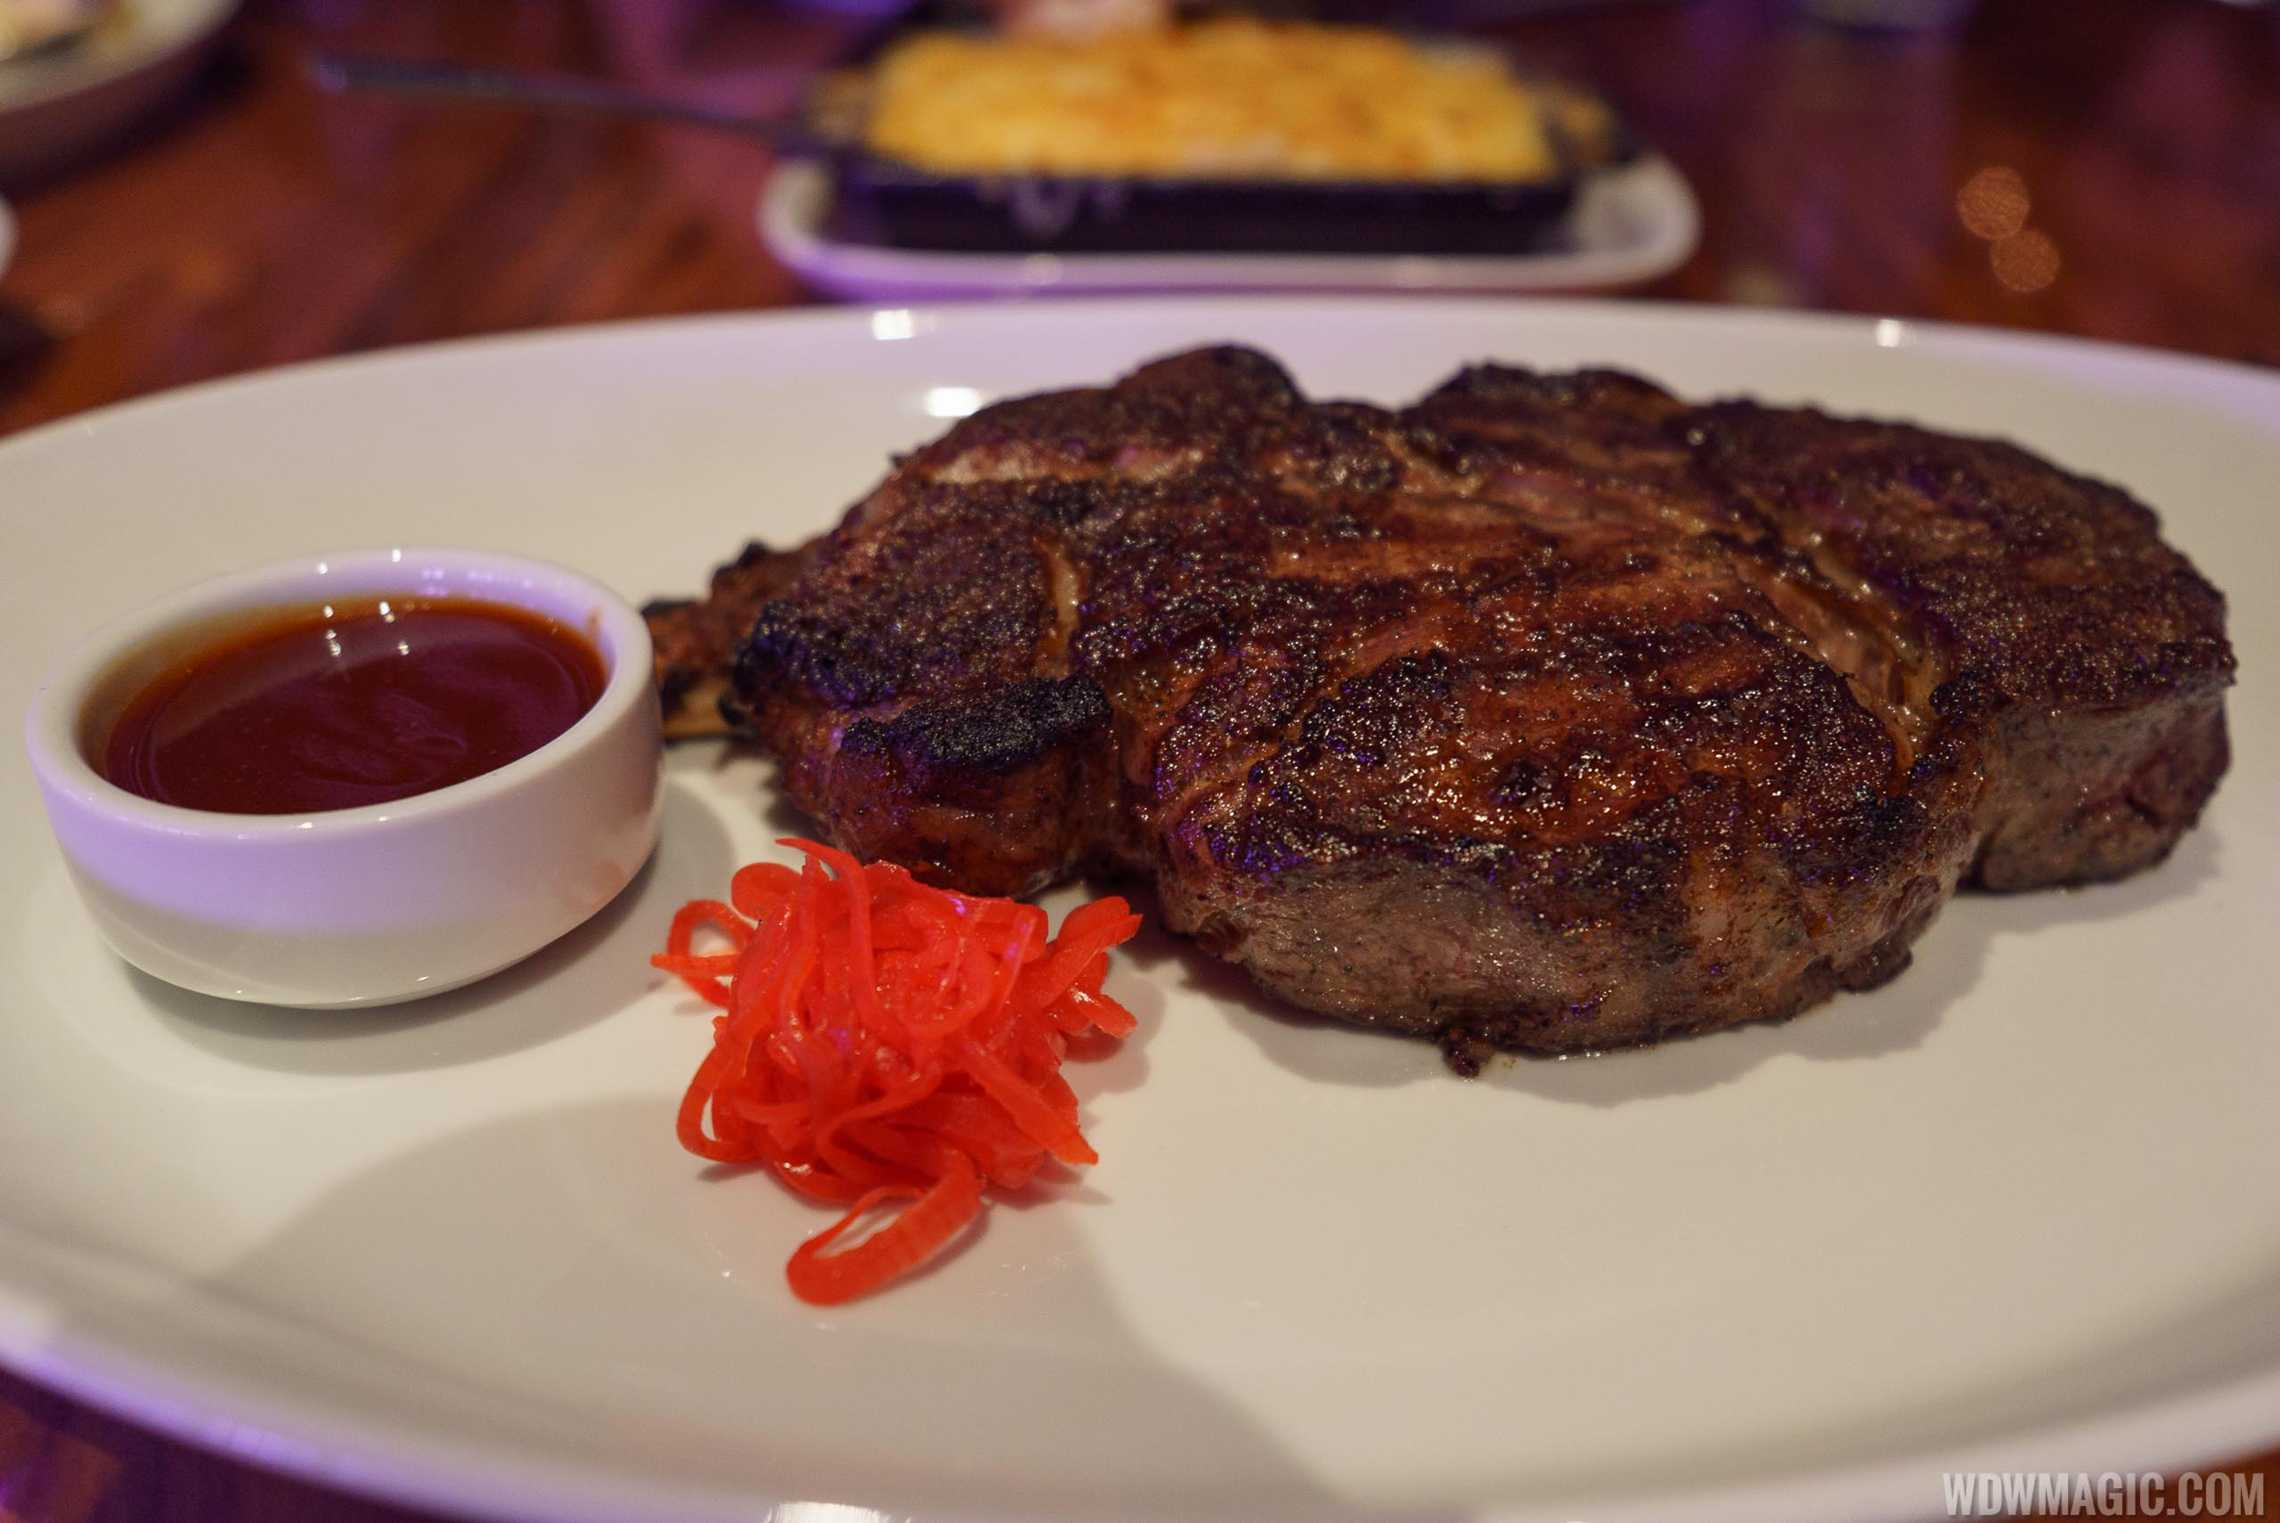 STK Orlando - Bone-In Rib Steak 20 oz.